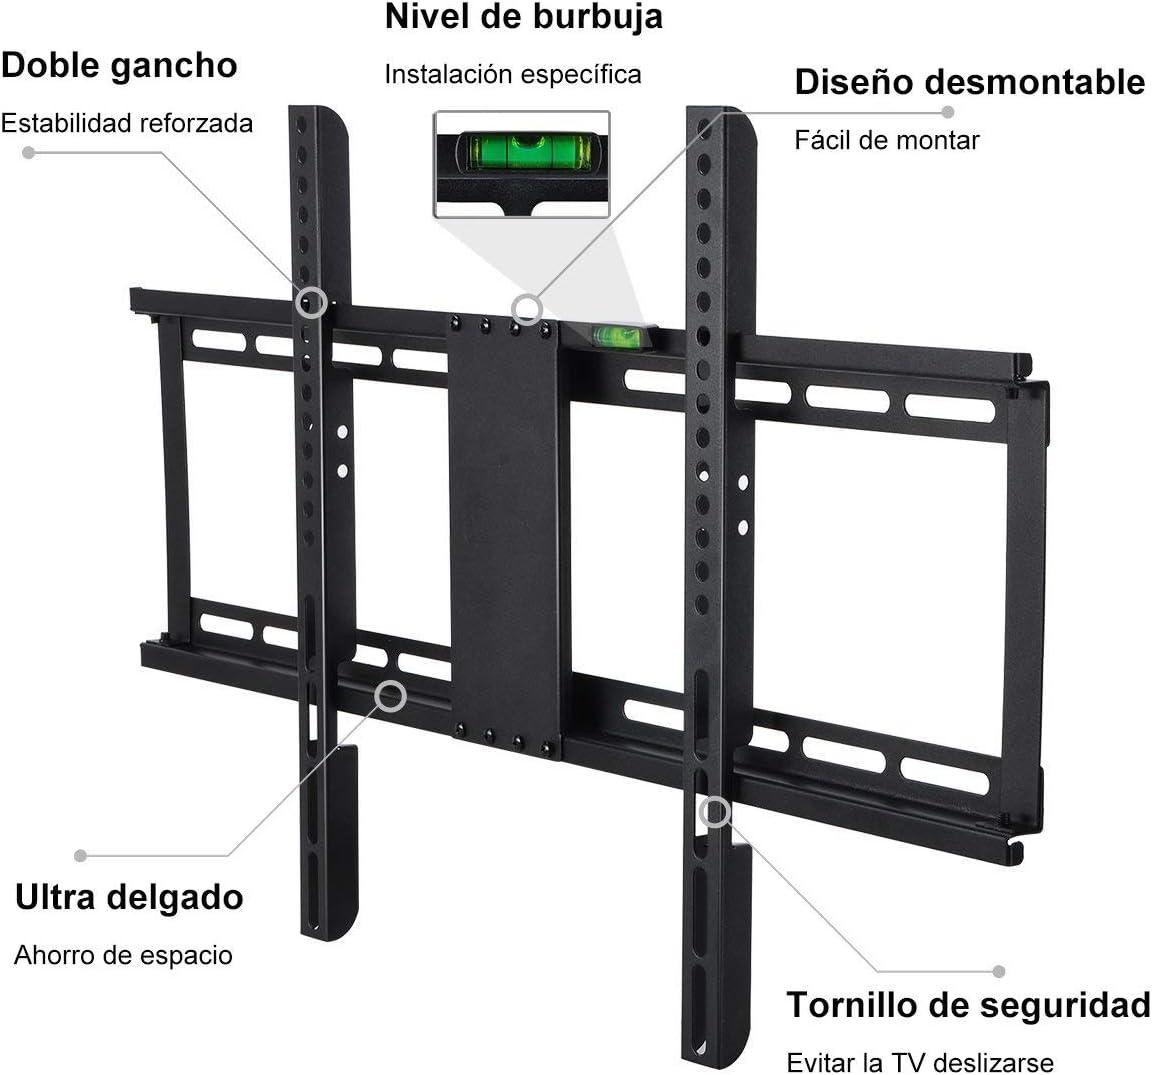 Inclinable y Giratorio 99lbs 35-94cm Carga 45KG para Televisores de Pantalla Plana LED LCD Plasma 4K 3D M/áx Vesa 200x200mm Famgizmo Soporte de Pared para TV 14-37 Pulgadas